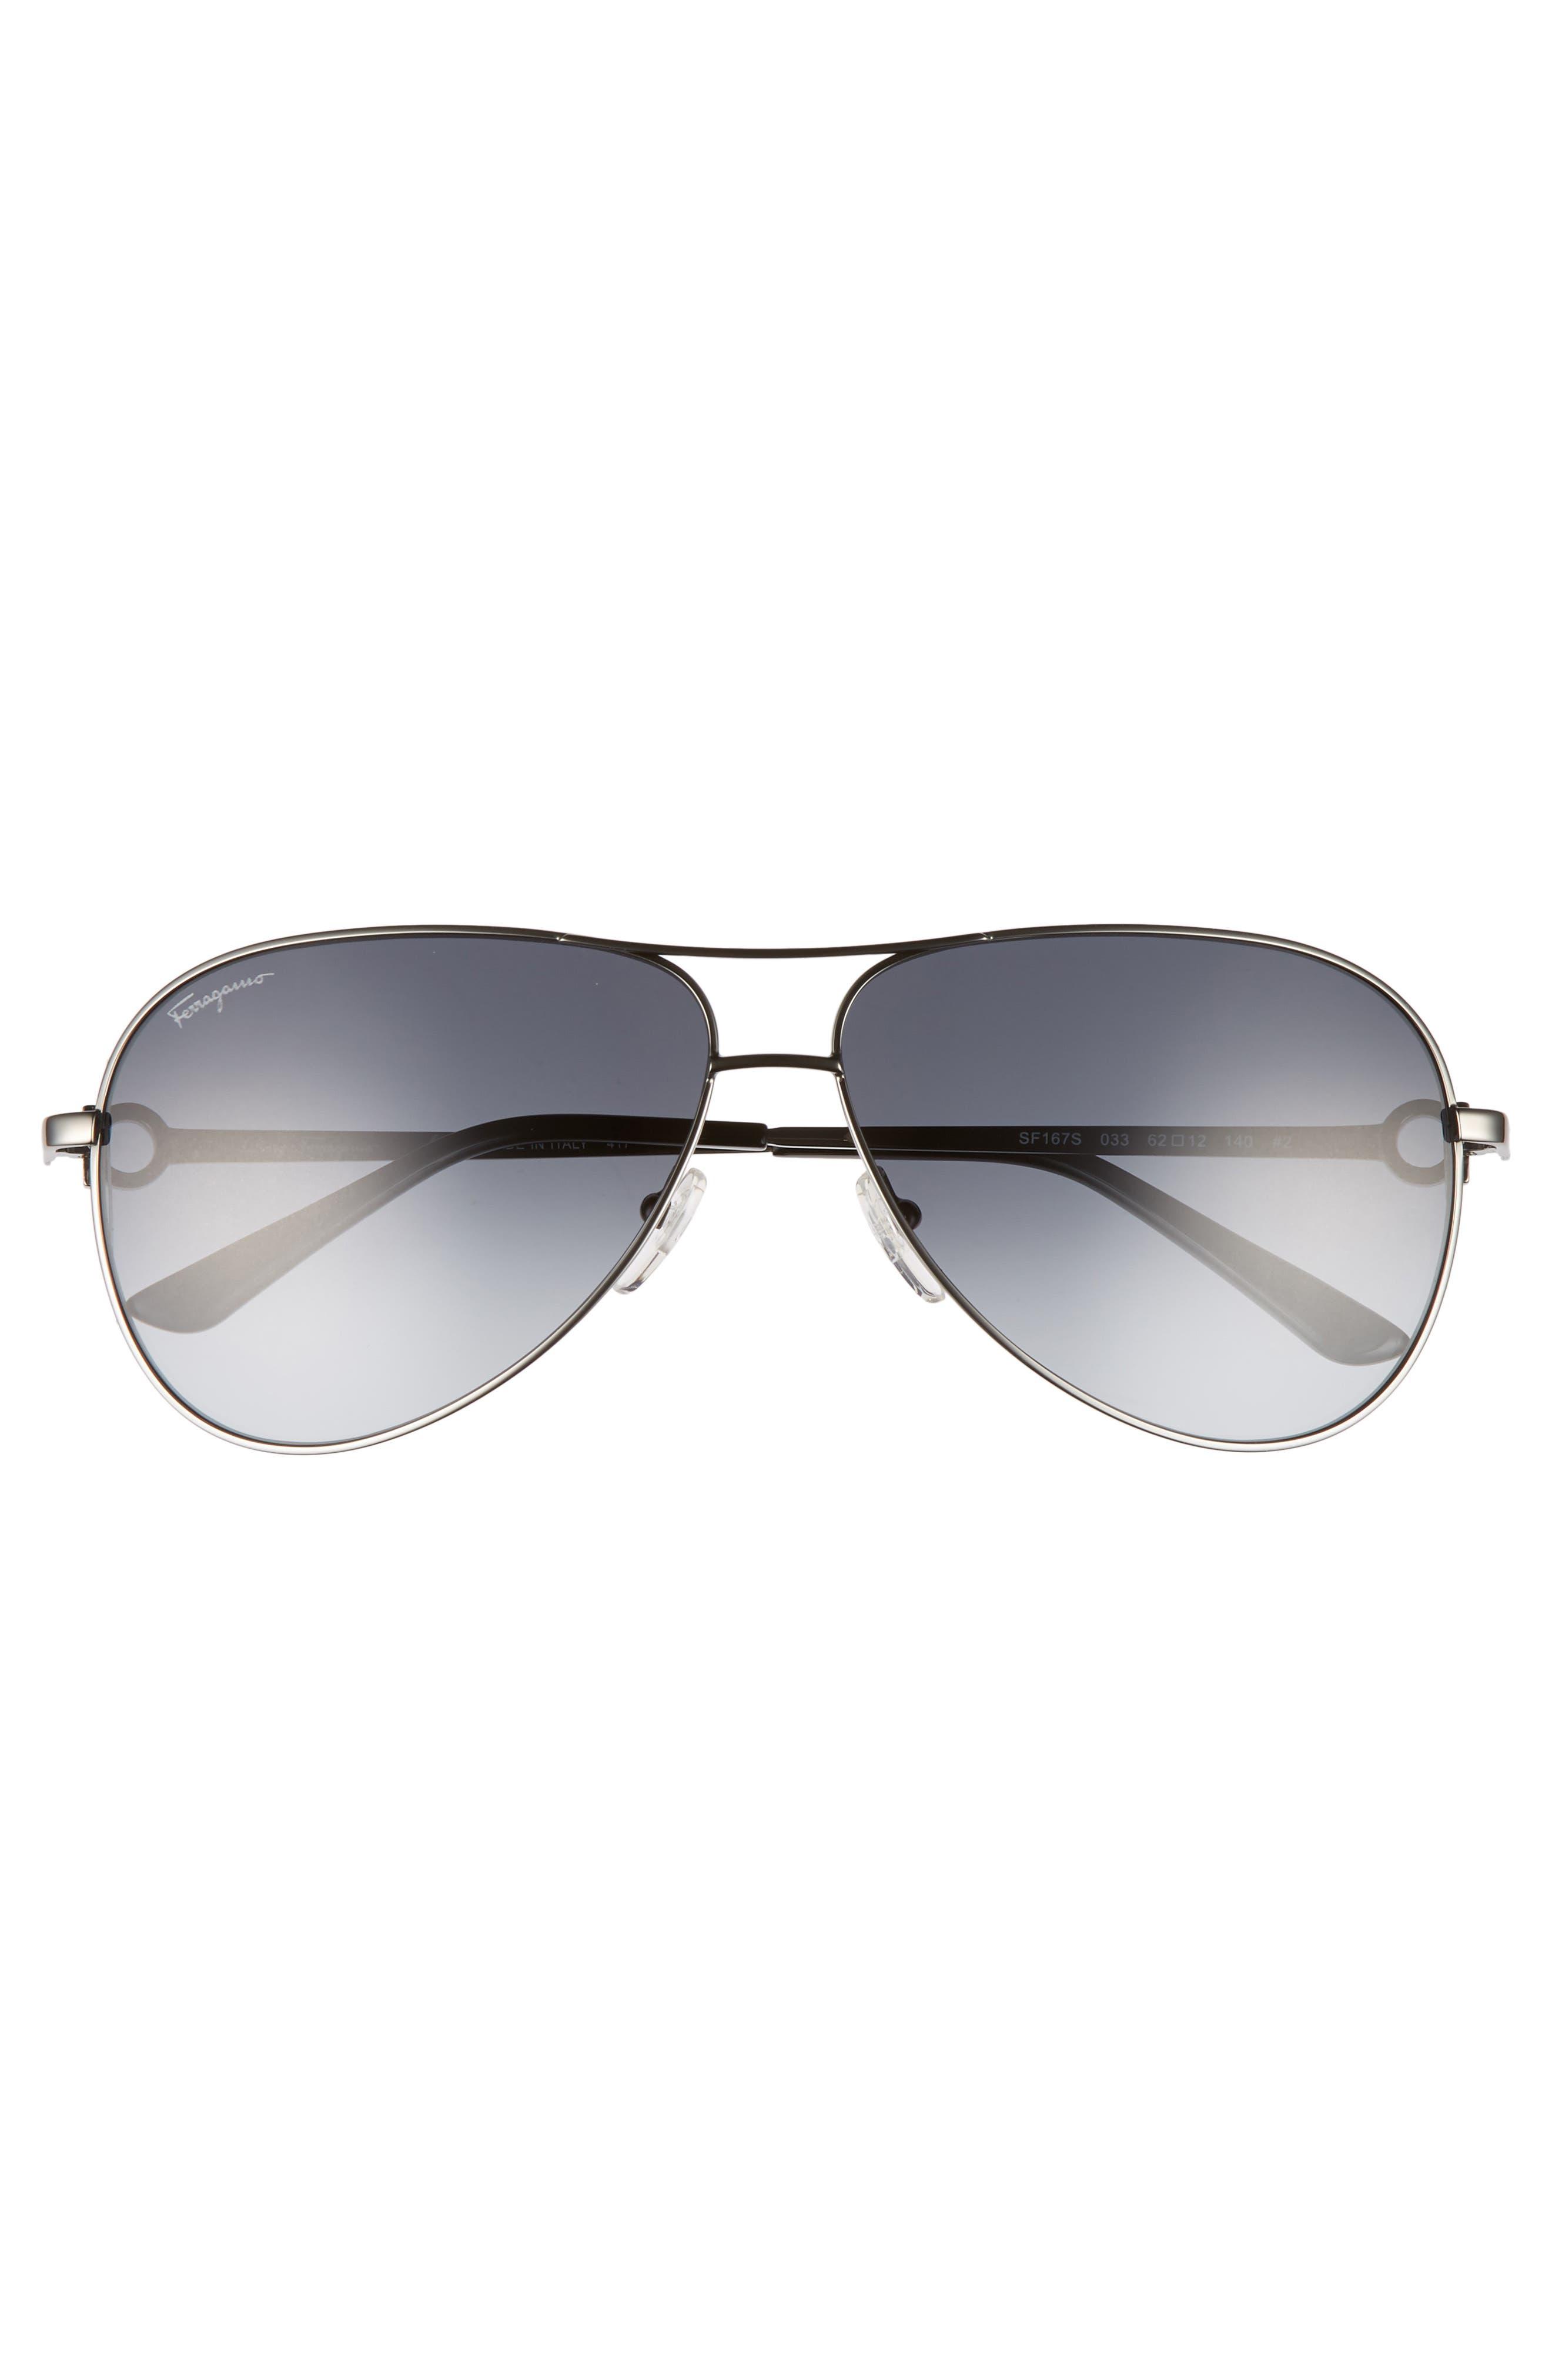 Gancio 62mm Aviator Sunglasses,                             Alternate thumbnail 2, color,                             SHINY DARK GUNMETAL